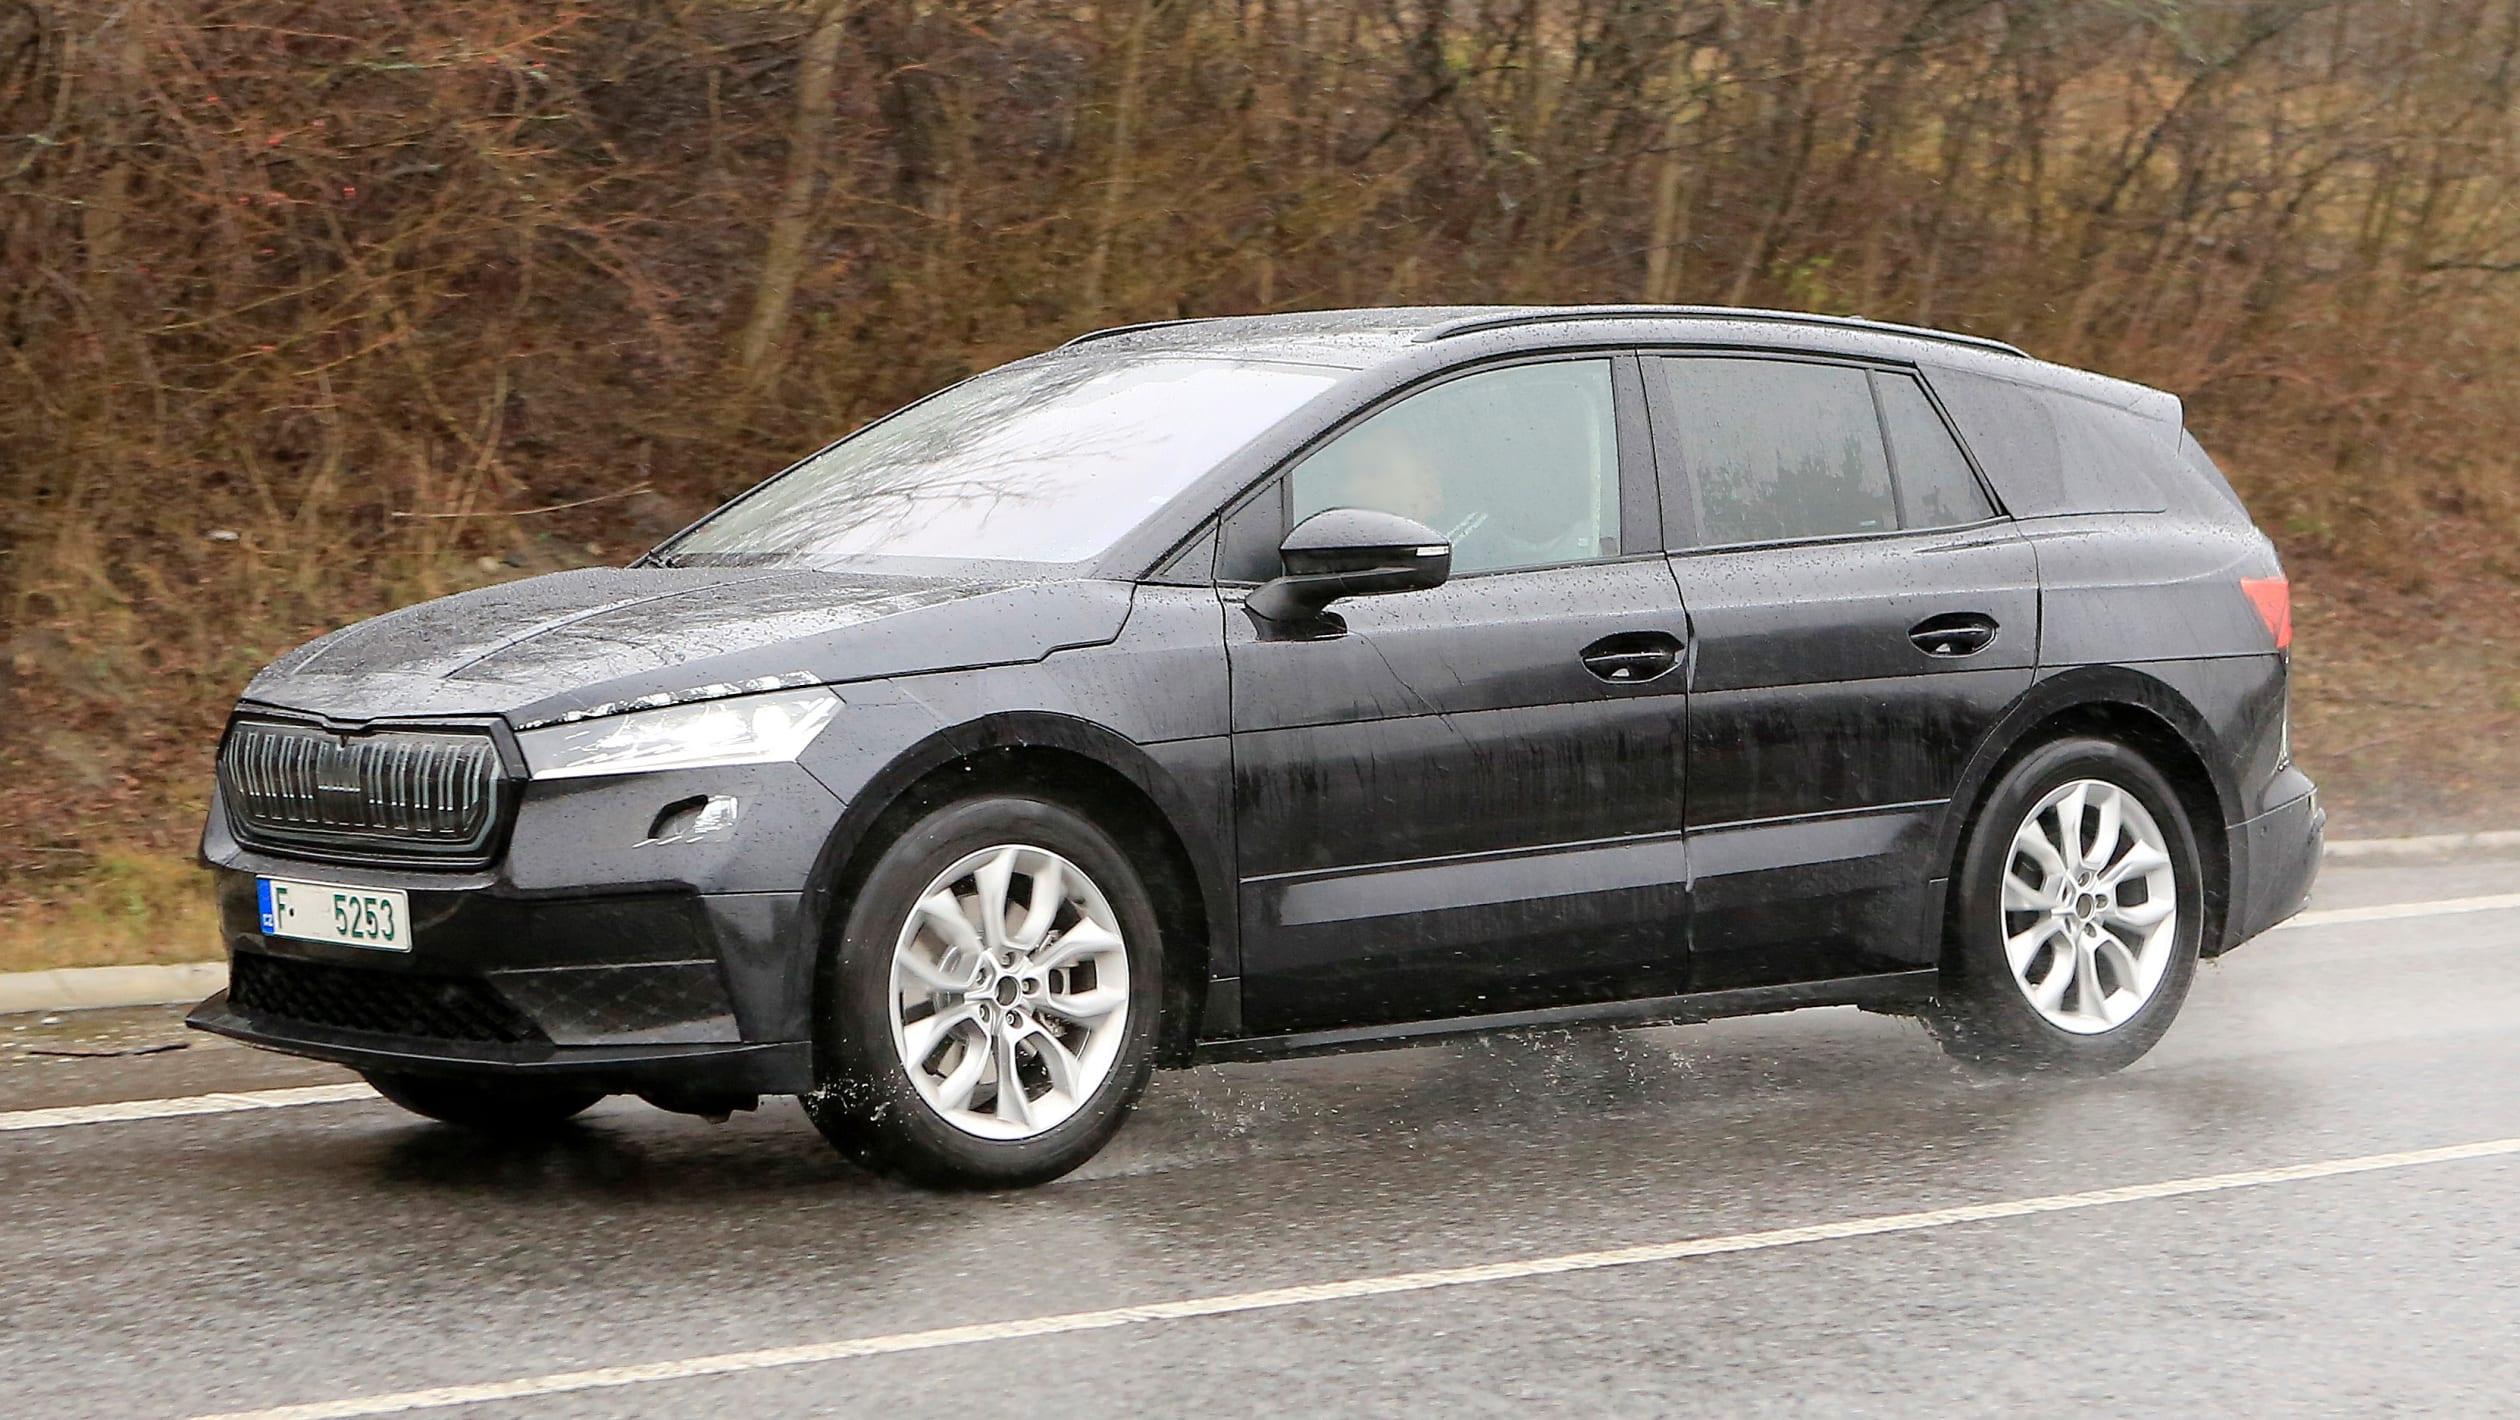 2021 - [Skoda] SUV EV - Page 3 2021%20Skoda%20Enyaq%20spied-4